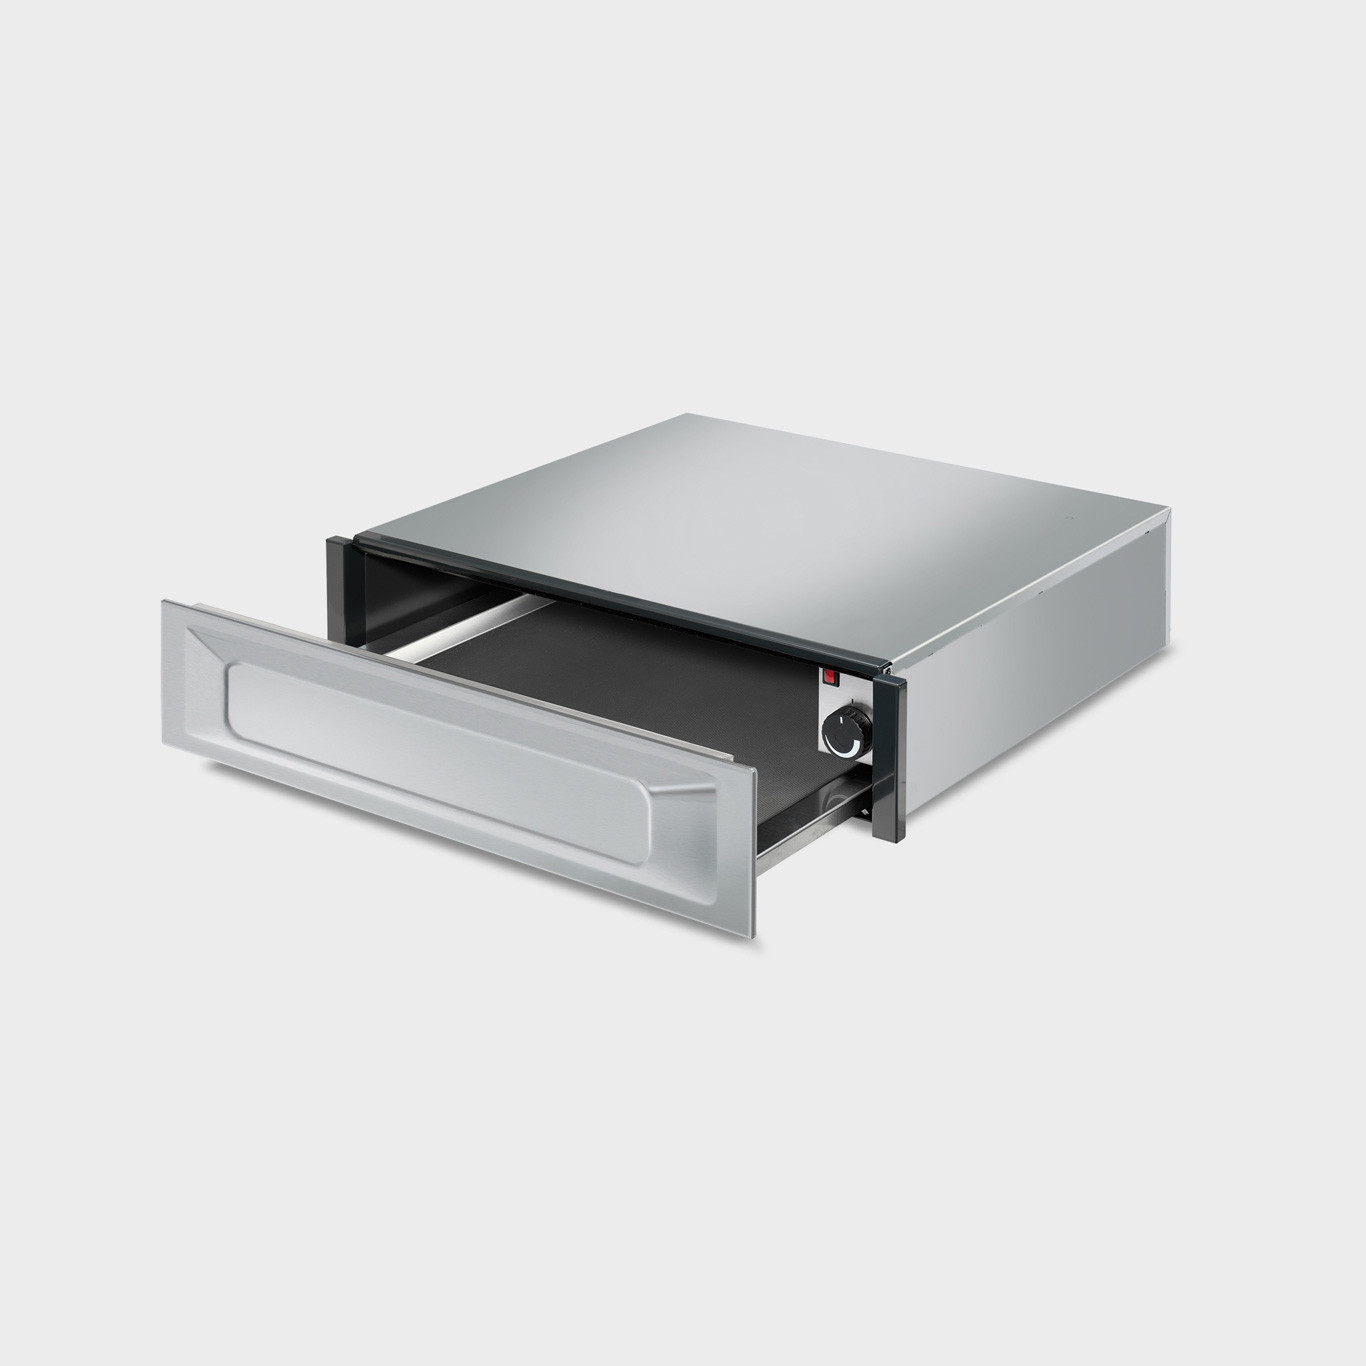 Smeg CTP9015X Victoria 15cm Stainless Steel Warming Drawer